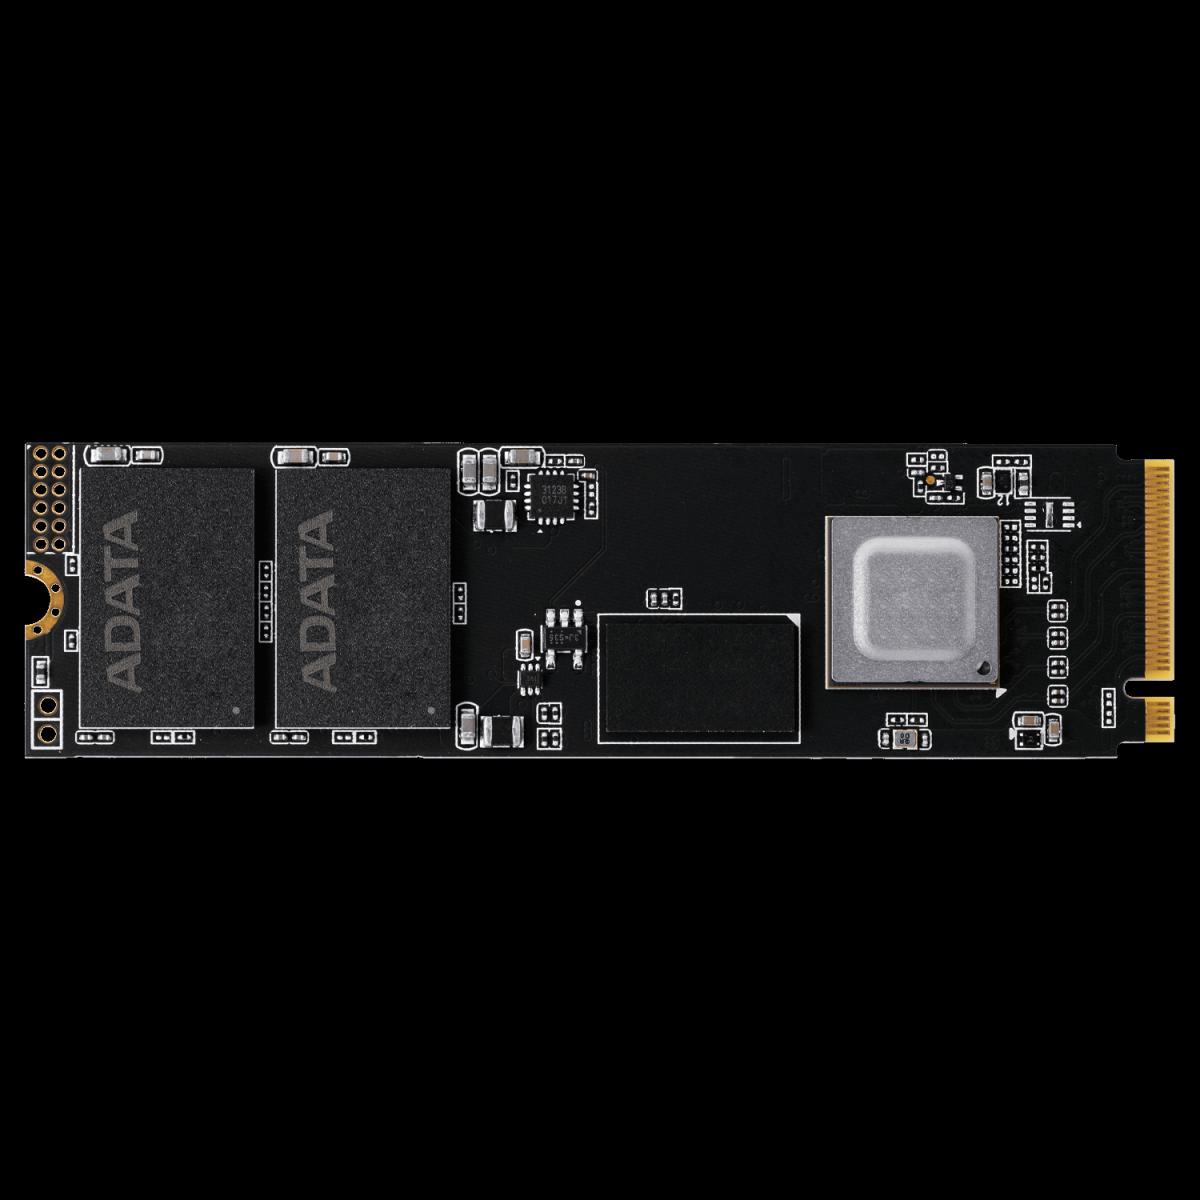 SSD XPG GAMMMIX S50 Lite 512GB, M.2 2280 NVMe, Leitura 3900MBs e Gravação 3200MBs, AGAMMIXS50L-512G-C